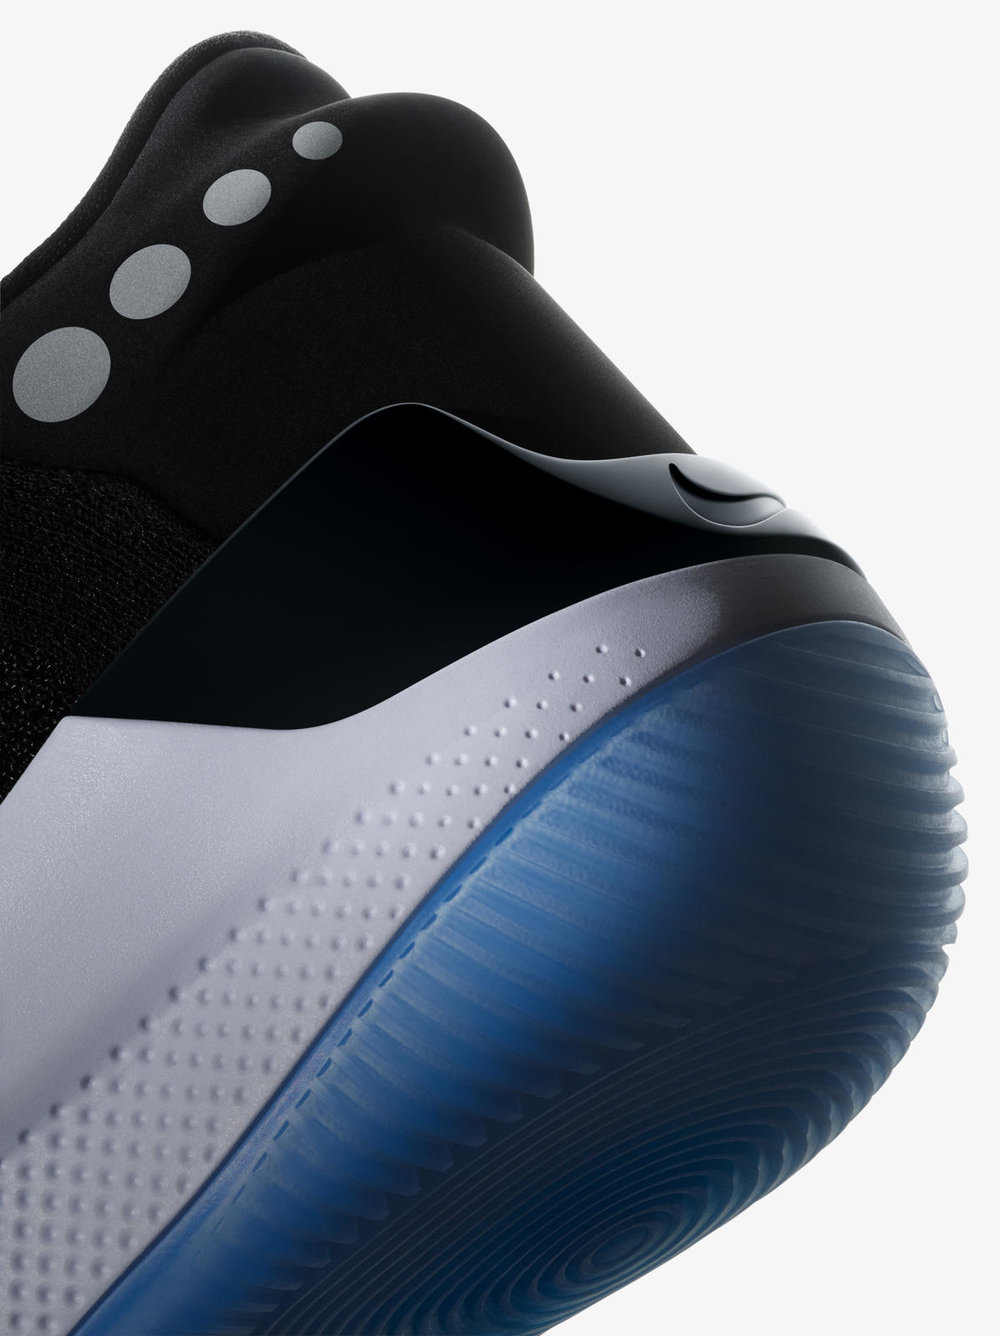 Sp19_BB_Nike_Adapt_20181218_NIKE0538_Detail6_native_1600.jpg